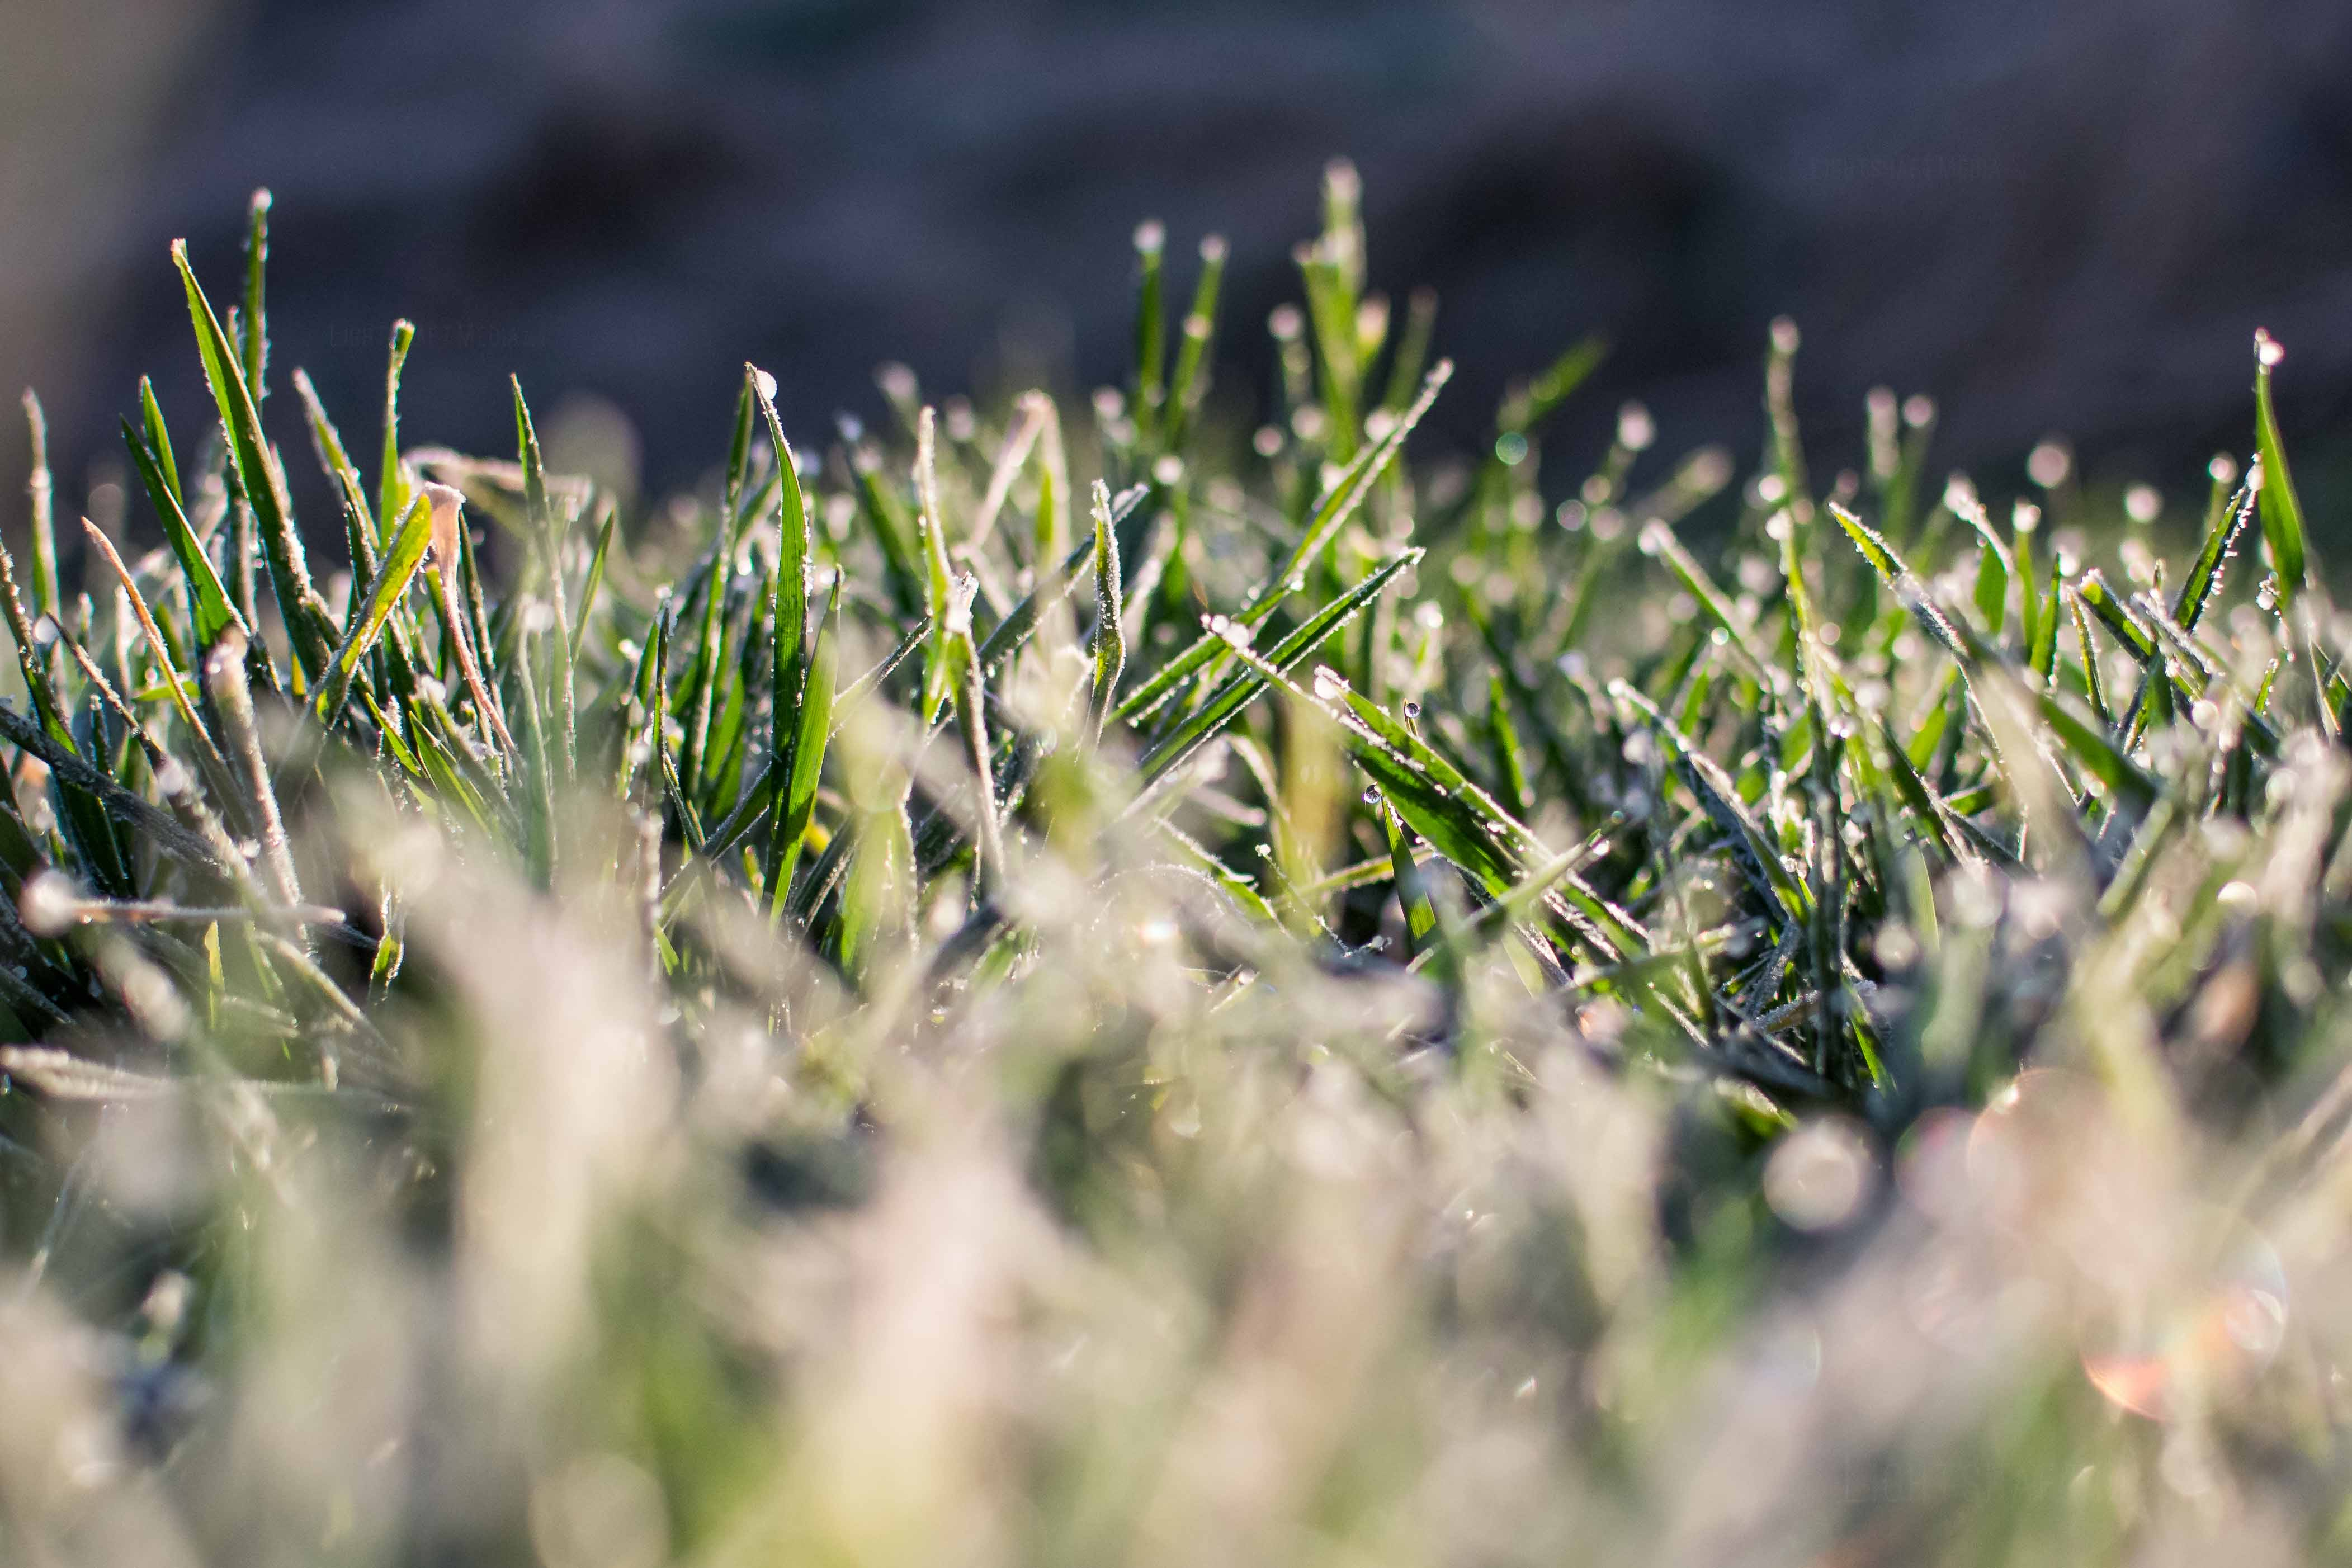 Rains Help Winter Wheat, Delay Corn Planting in Kansas